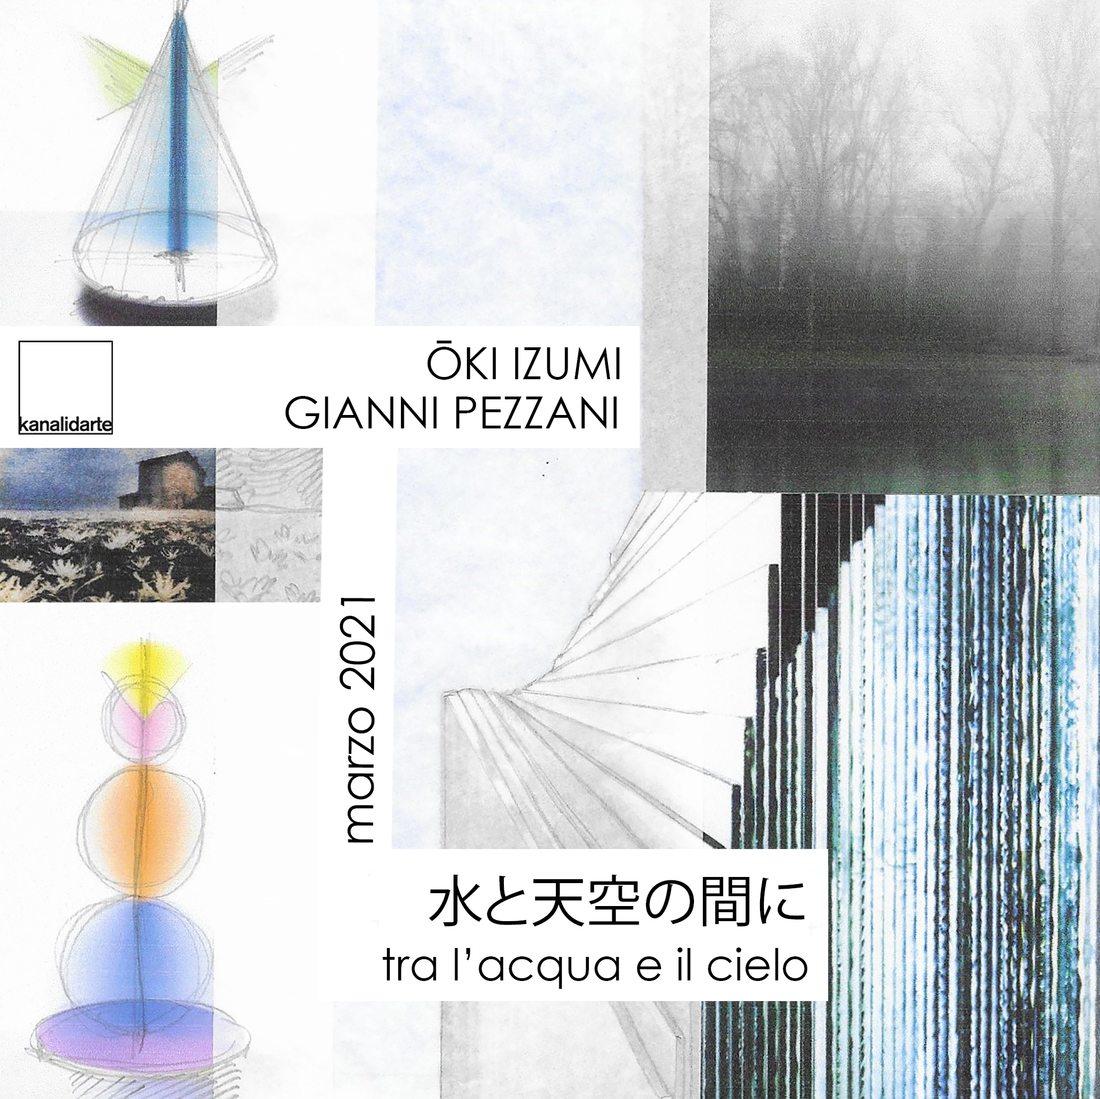 Ōki Izumi - Gianni Pezzani, Tra l'Acqua e il cielo